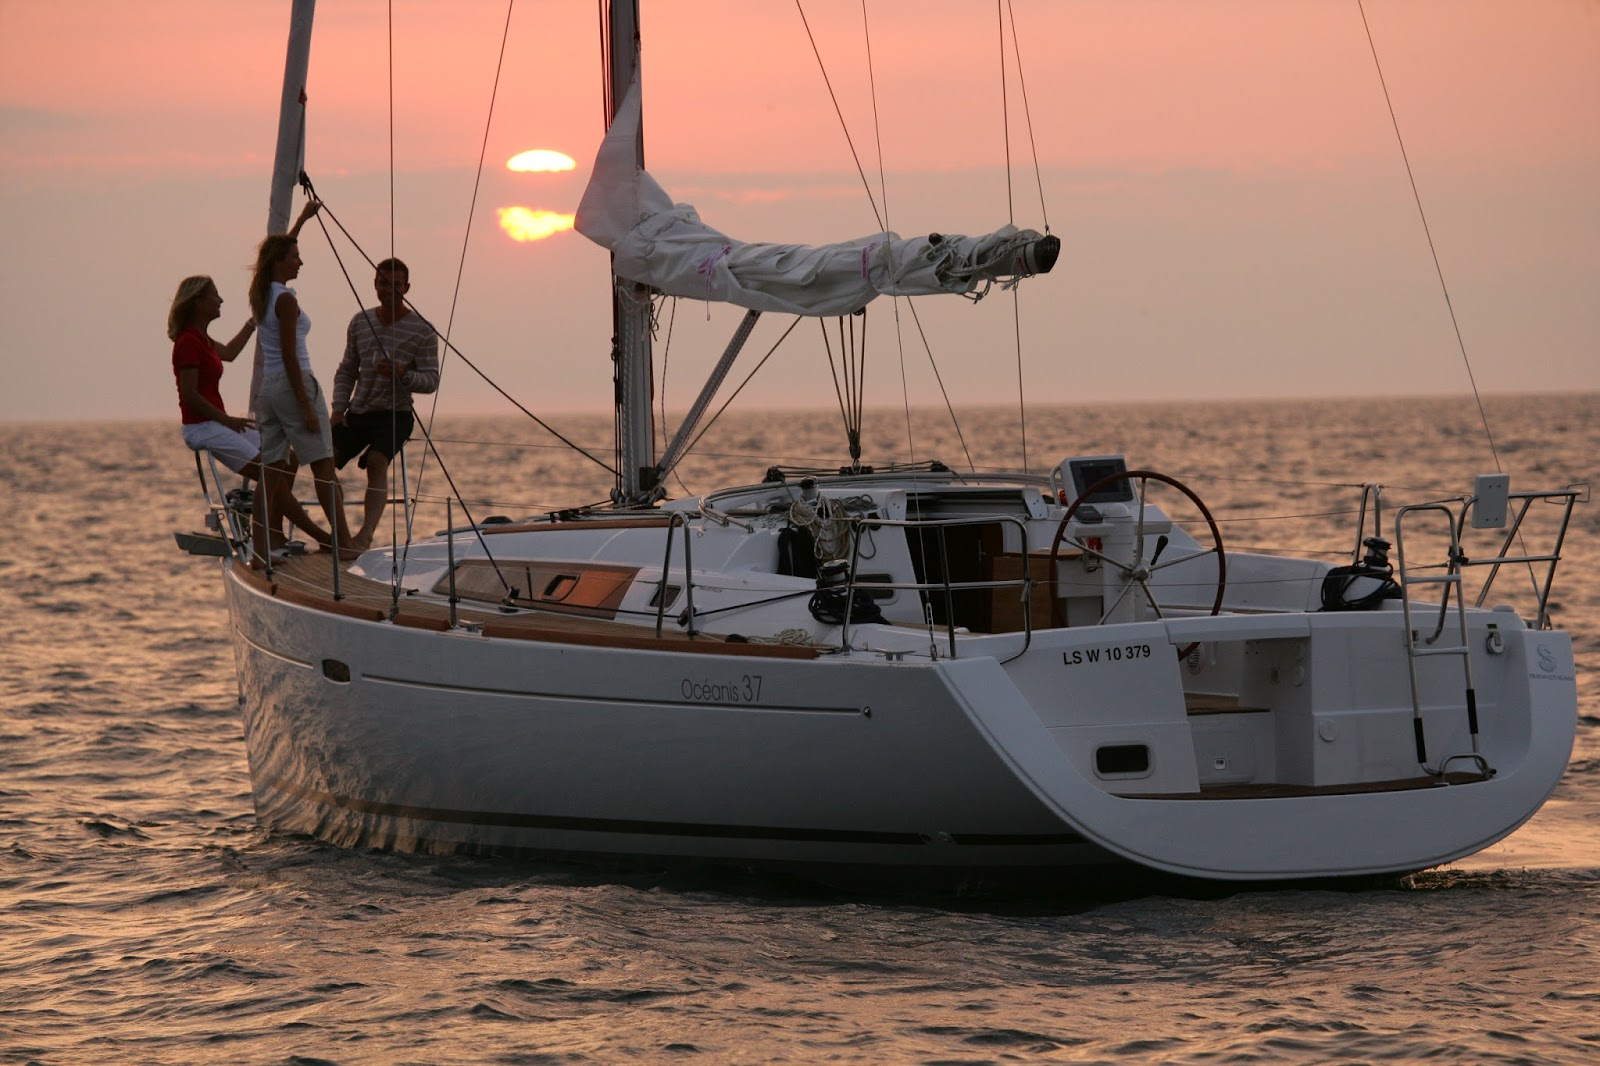 alquiler de veleros baratos en ibiza. alquiler veleros baratod ibiza. alquiler de barcos en ibiza. alquiler barcos ibiza. alquilar yates en ibiza. barcos de alquiler en ibiza